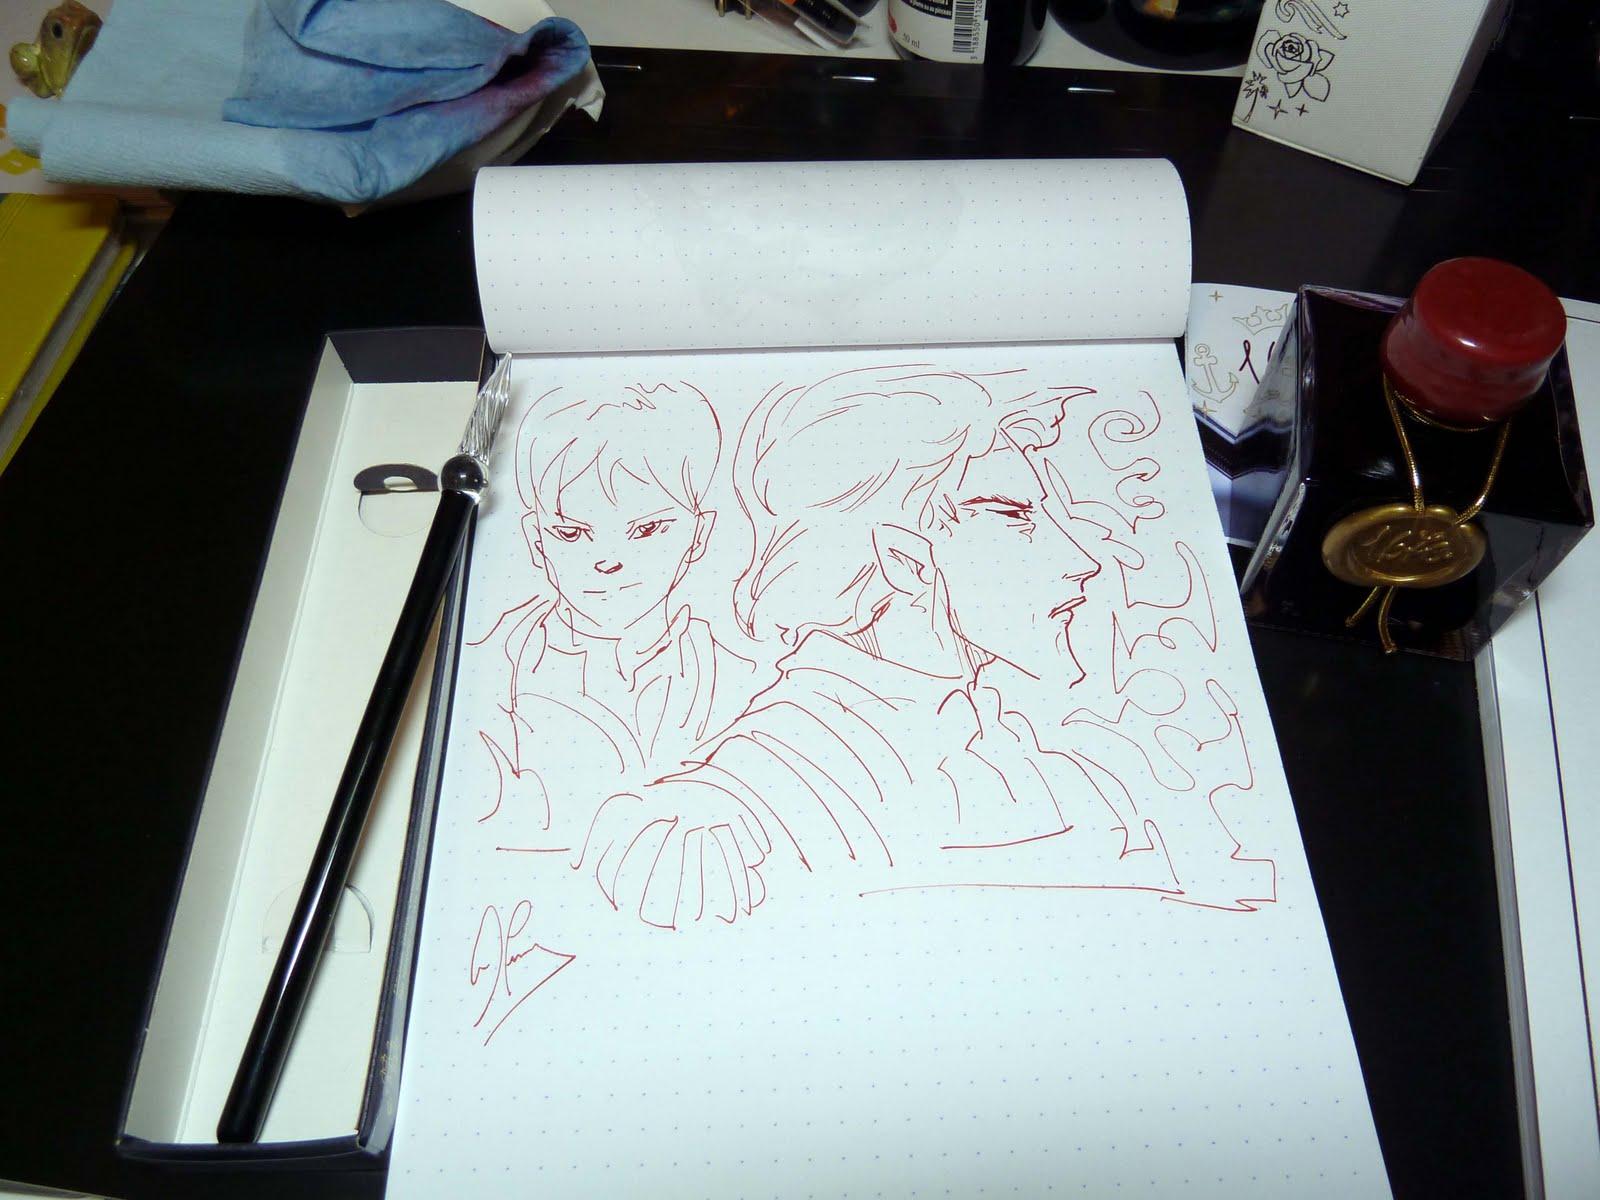 http://1.bp.blogspot.com/_idUARdOEJAk/TDbS0jRKx3I/AAAAAAAAHi8/pQoS8WqaDuU/s1600/J+Herbin+1670+test+doodle+on+Rhodia+dotPad.jpg